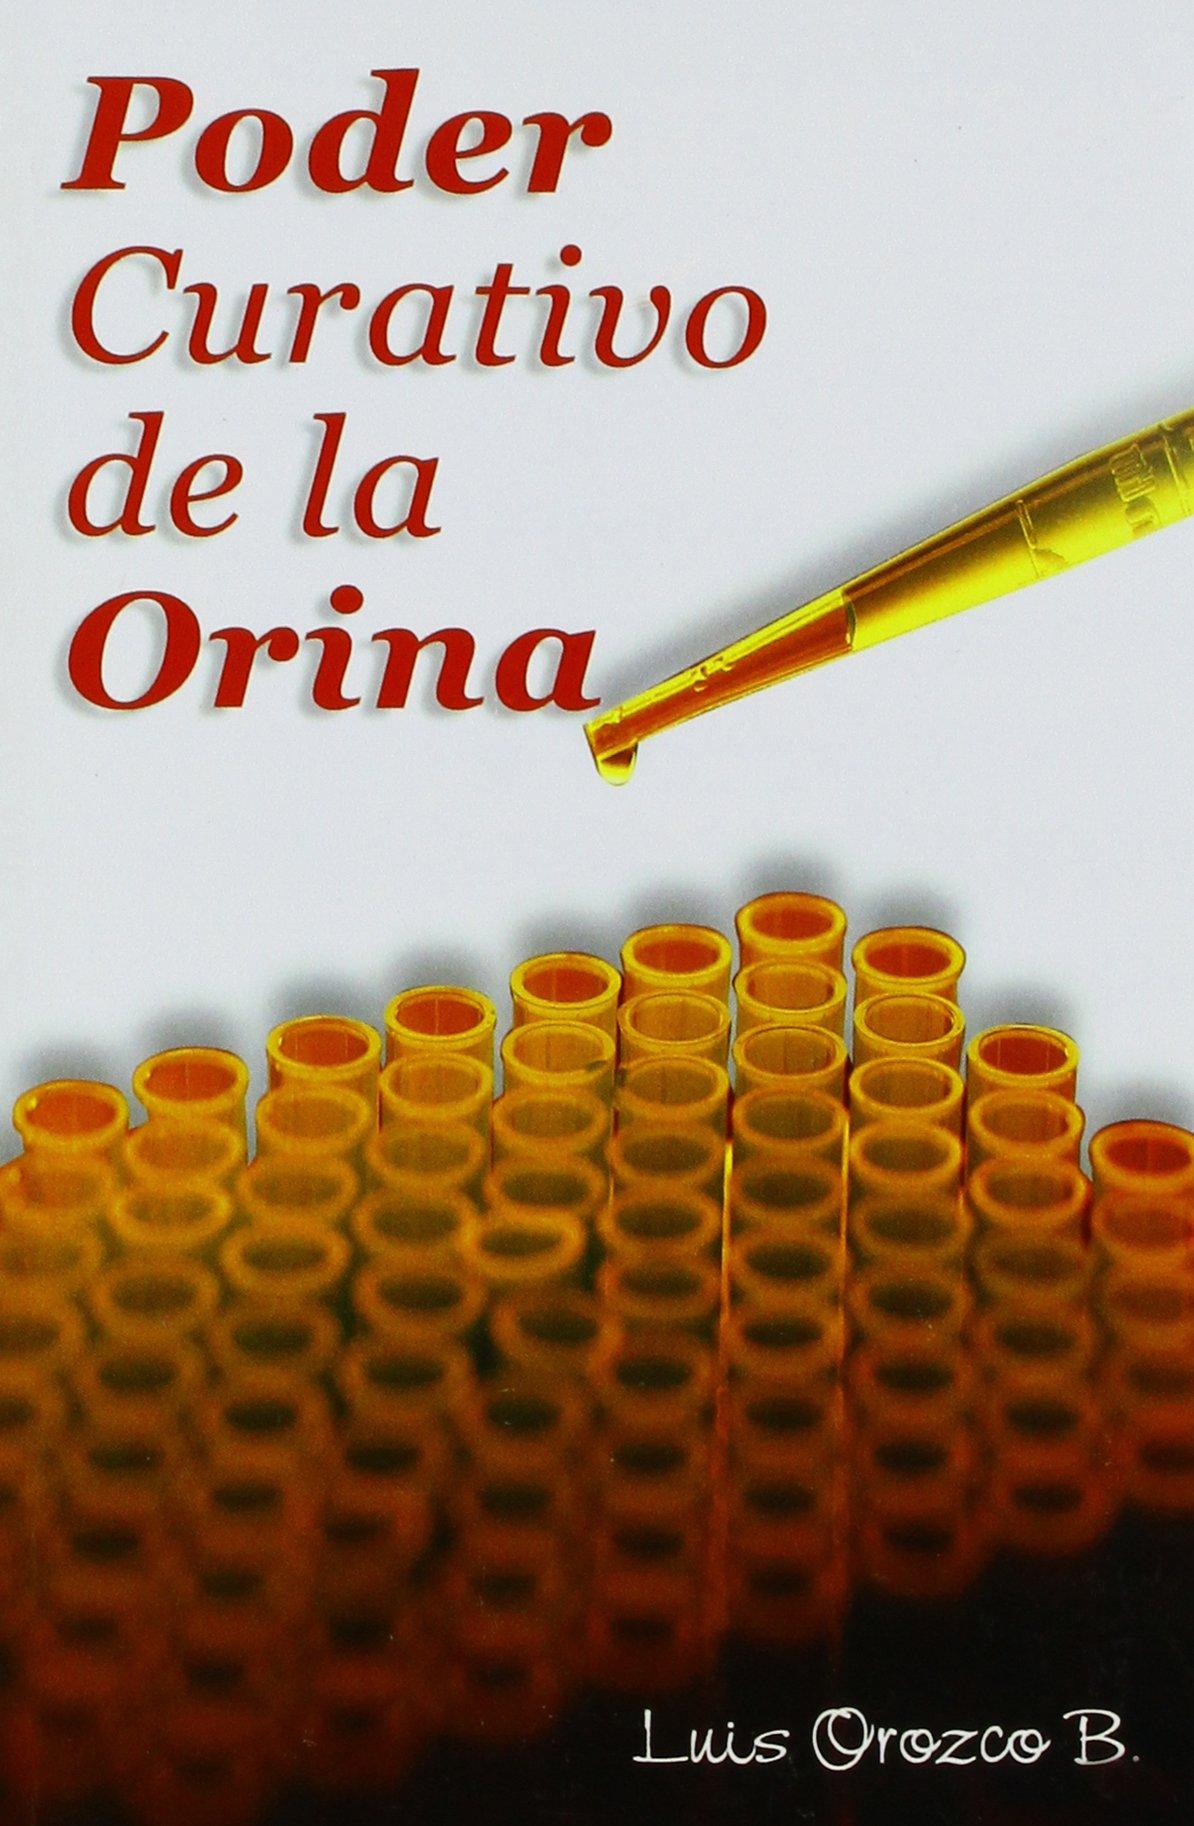 Poder curativo de la orina (Spanish Edition) ebook